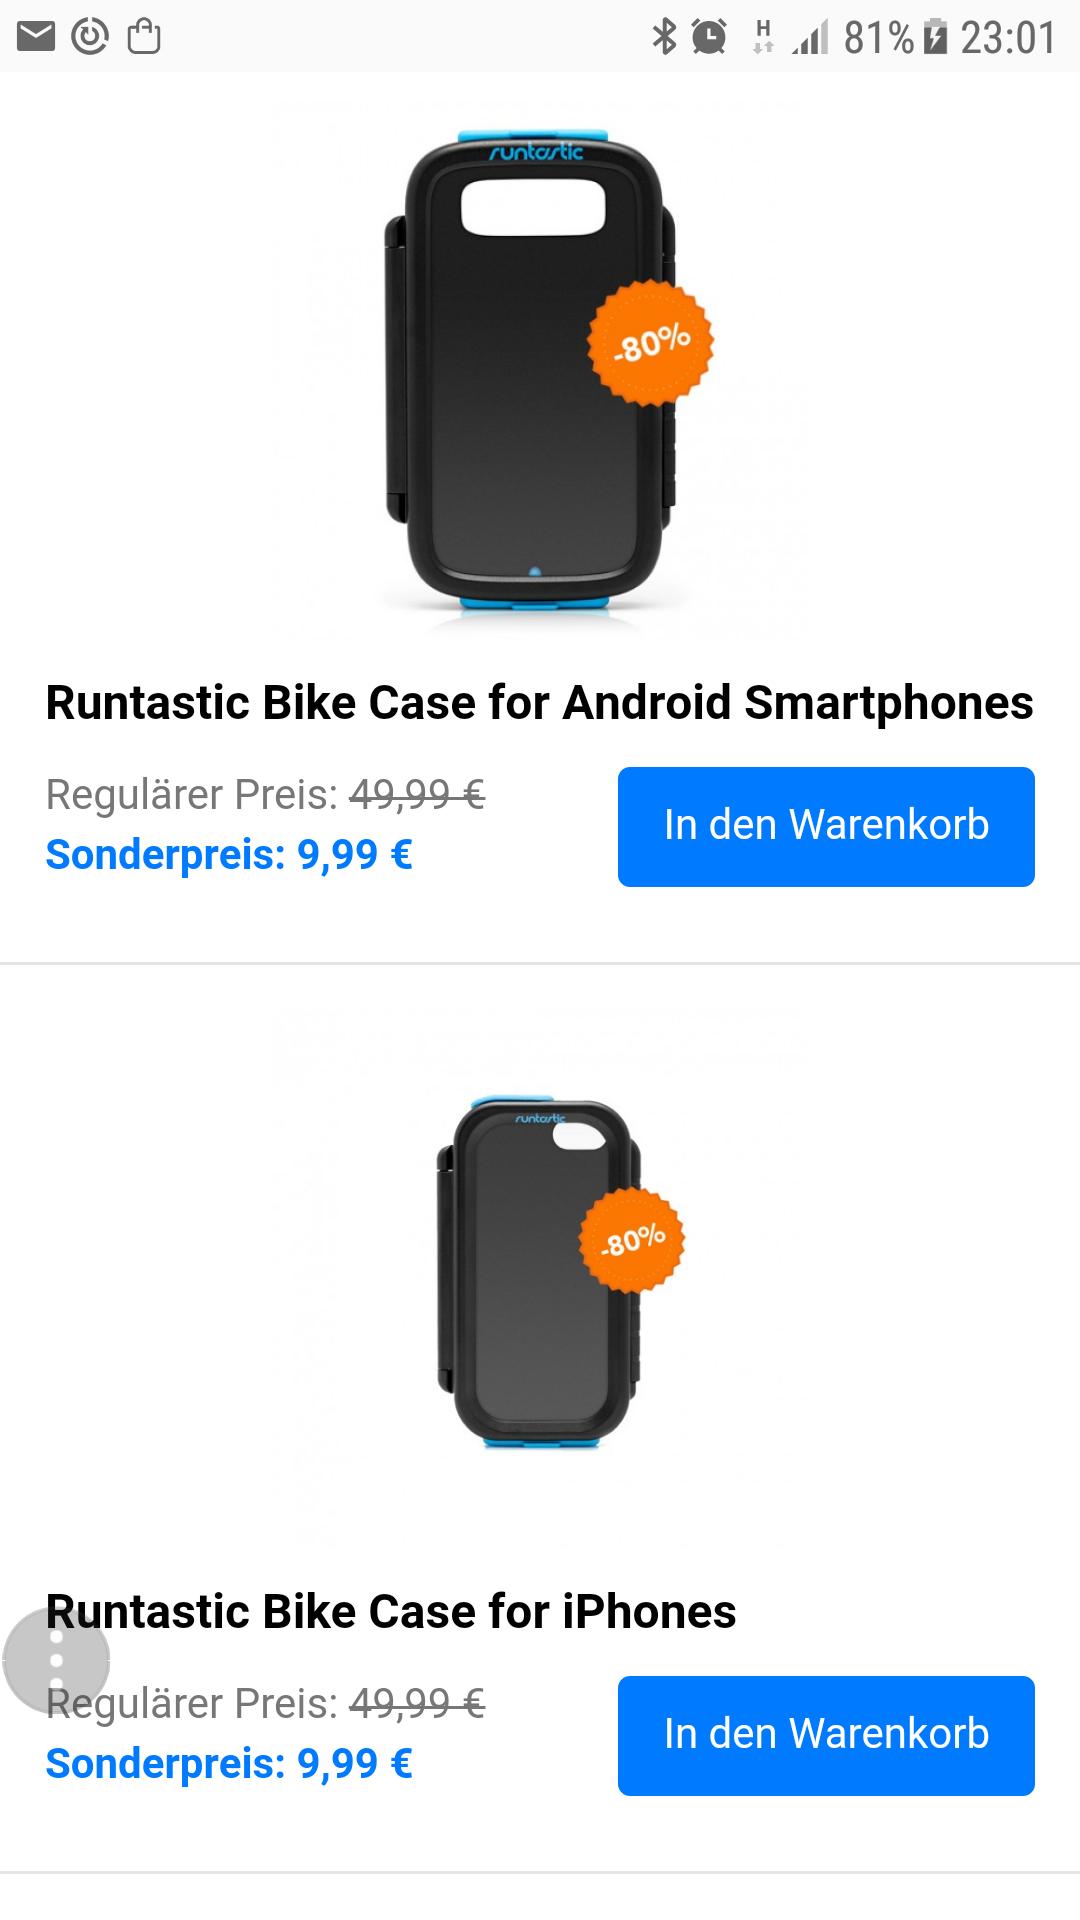 Sale beim Runtastic Shop Smartphone Case